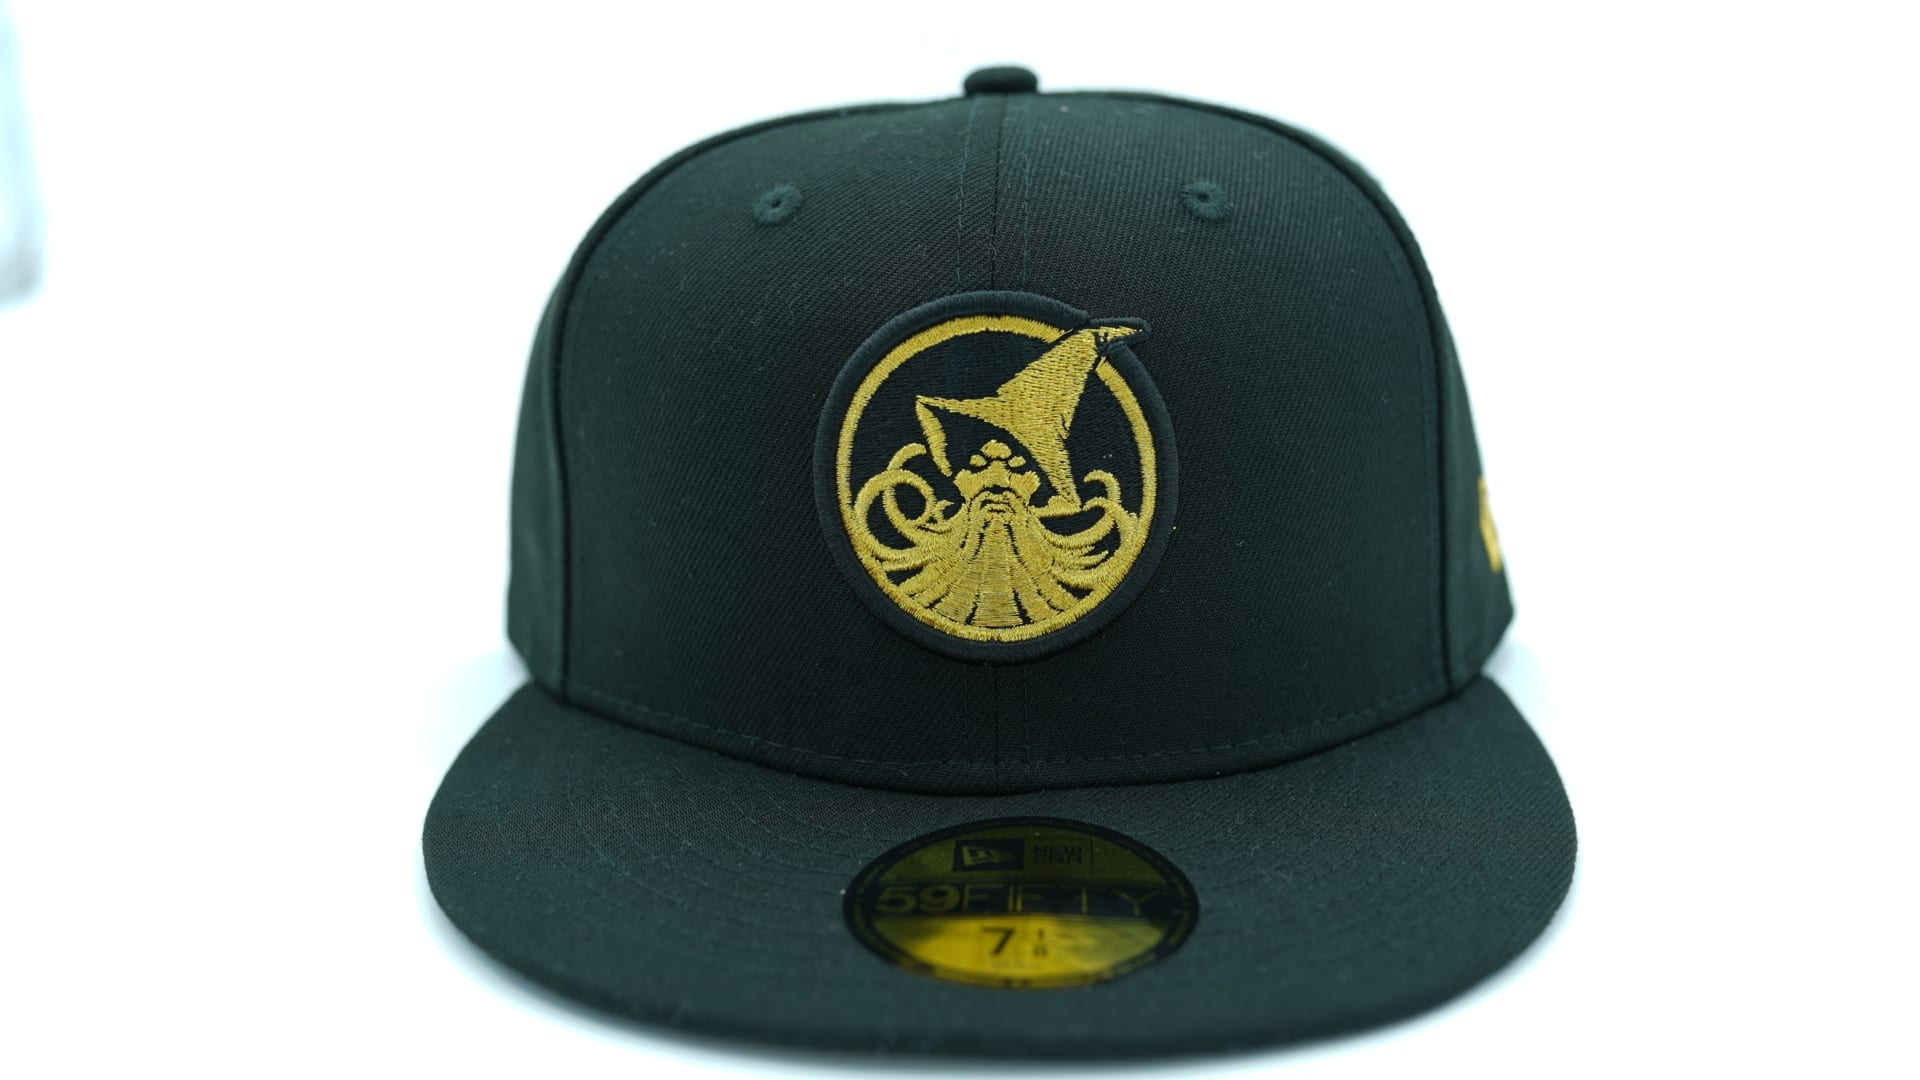 d6f789fd86f1c italy justice league logo 59fifty fitted cap by new era x dc comics a95fa  f864e